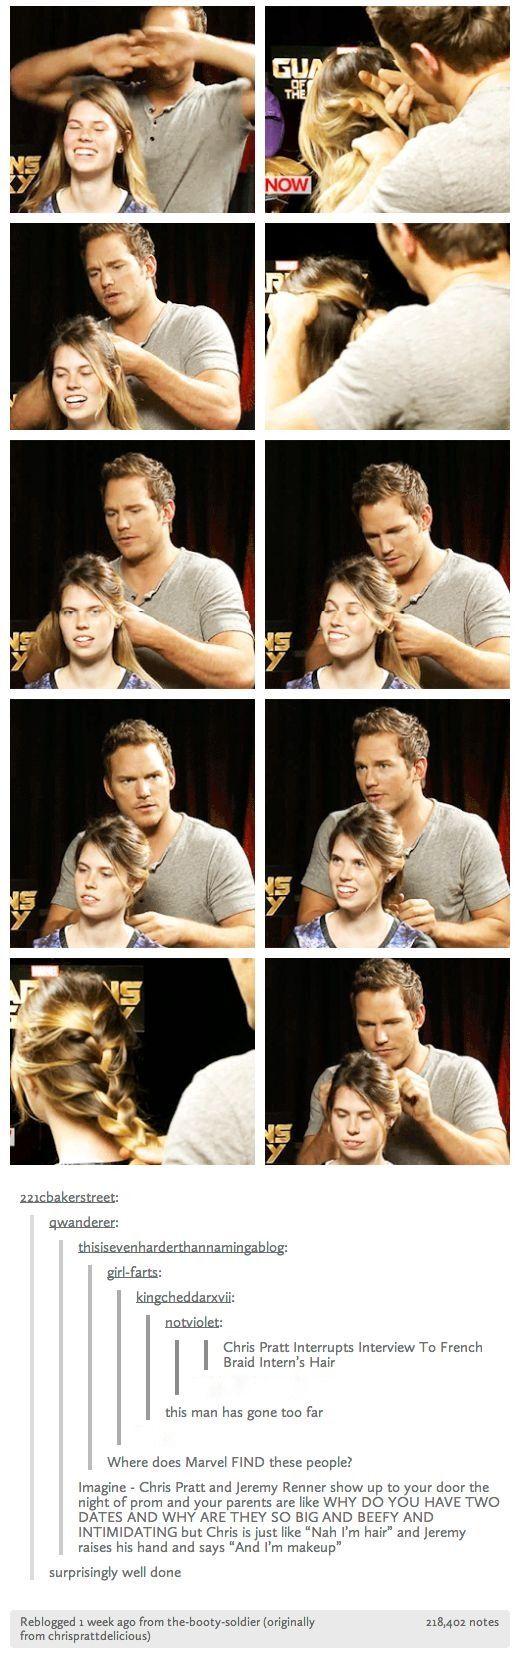 Chris Pratt french braids interviewer's hair. This man.